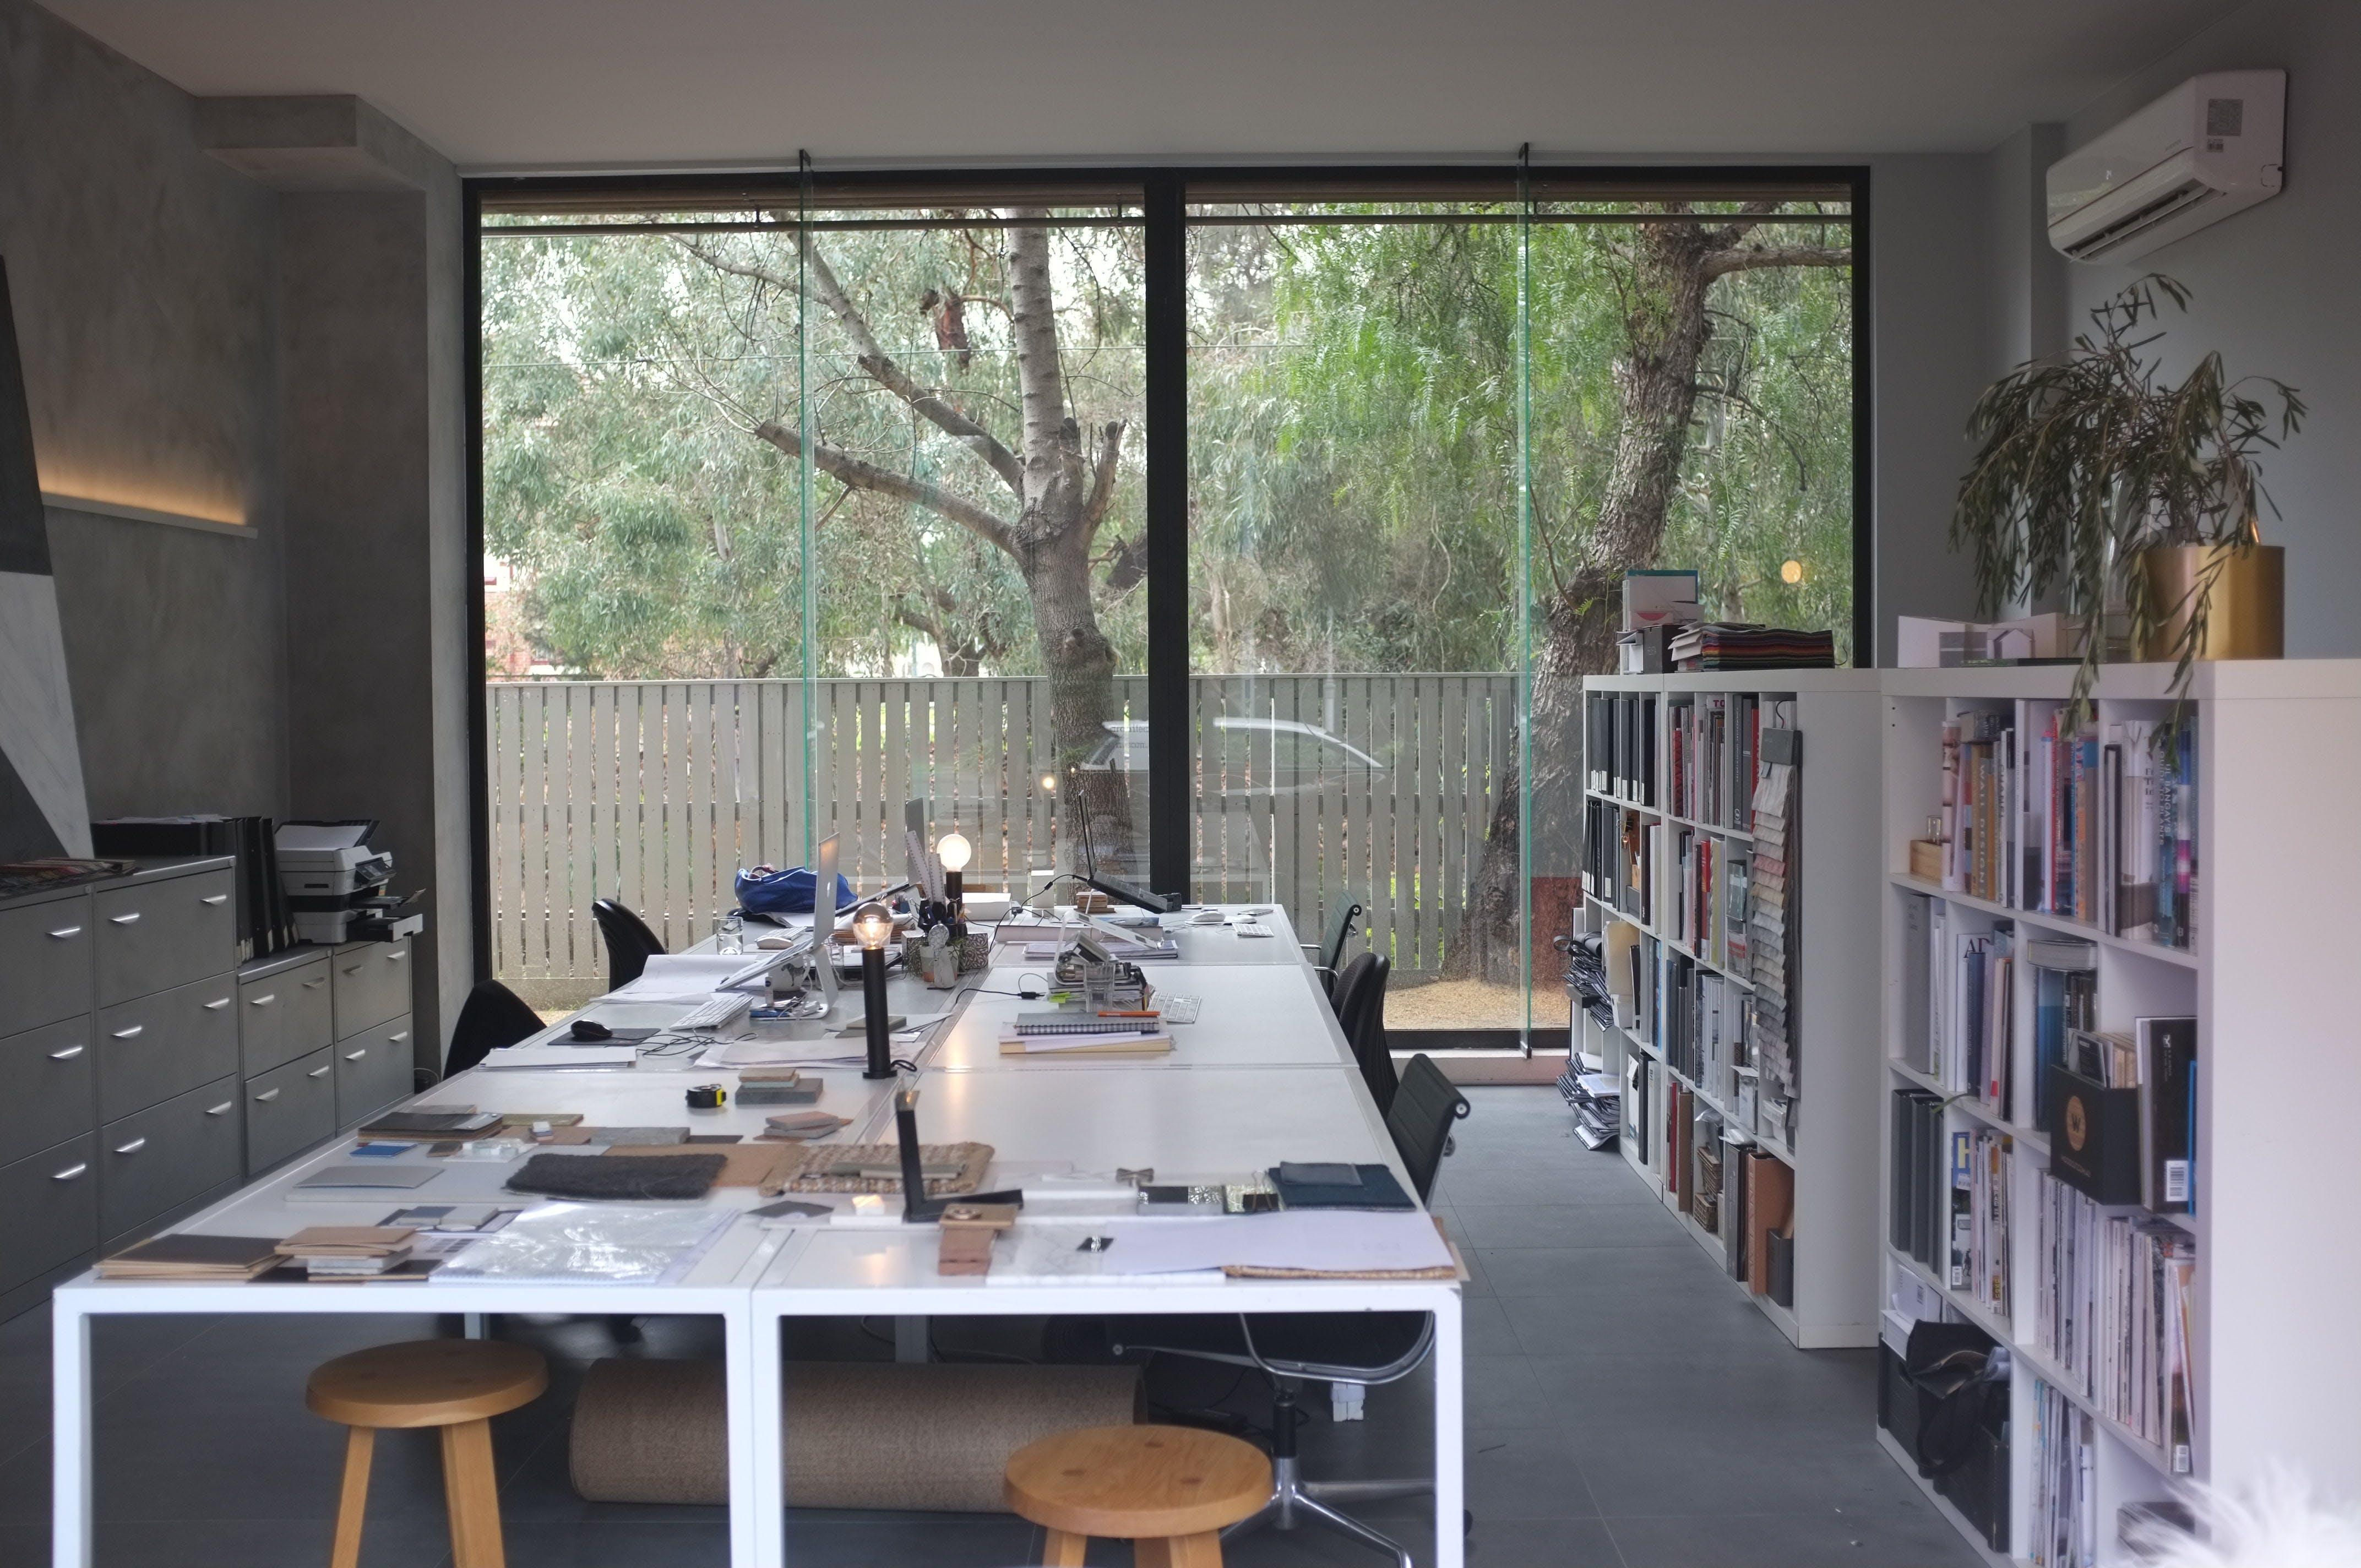 Share Space, shopfront at Design Studio, image 5